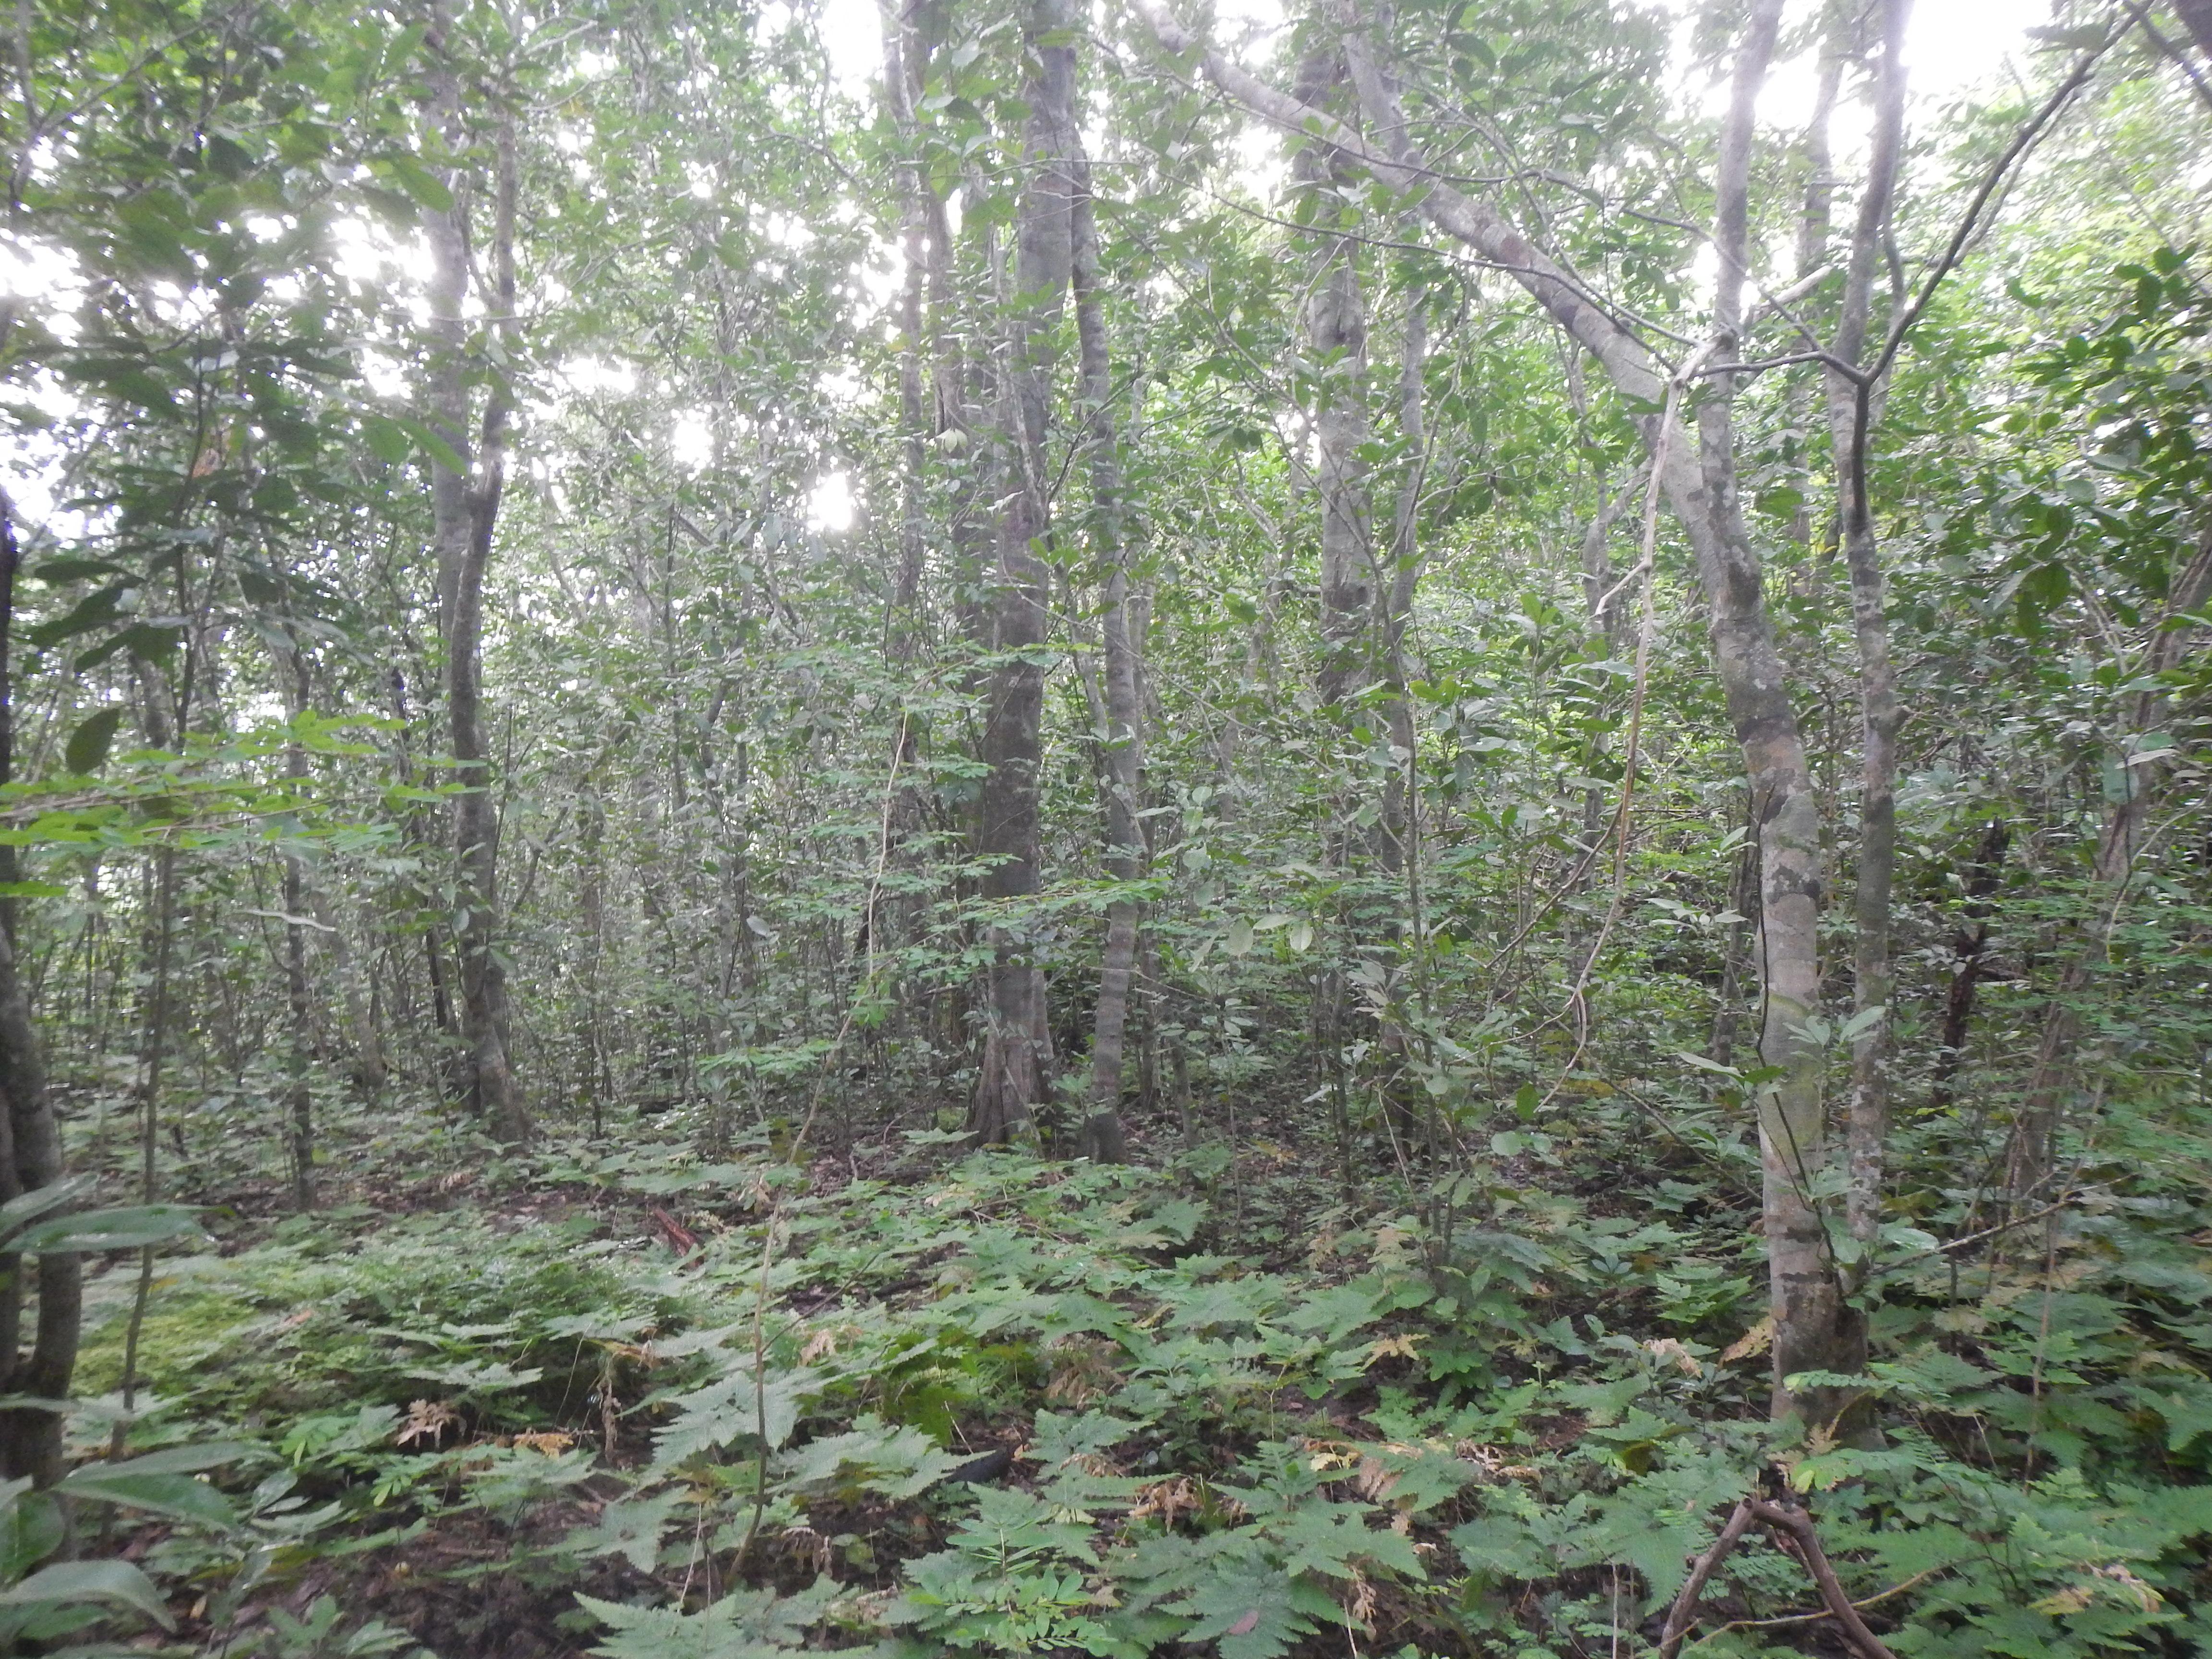 Kounounkan submontane forest near Gbara. (Photo: © Xander van der Burgt, RBG Kew)